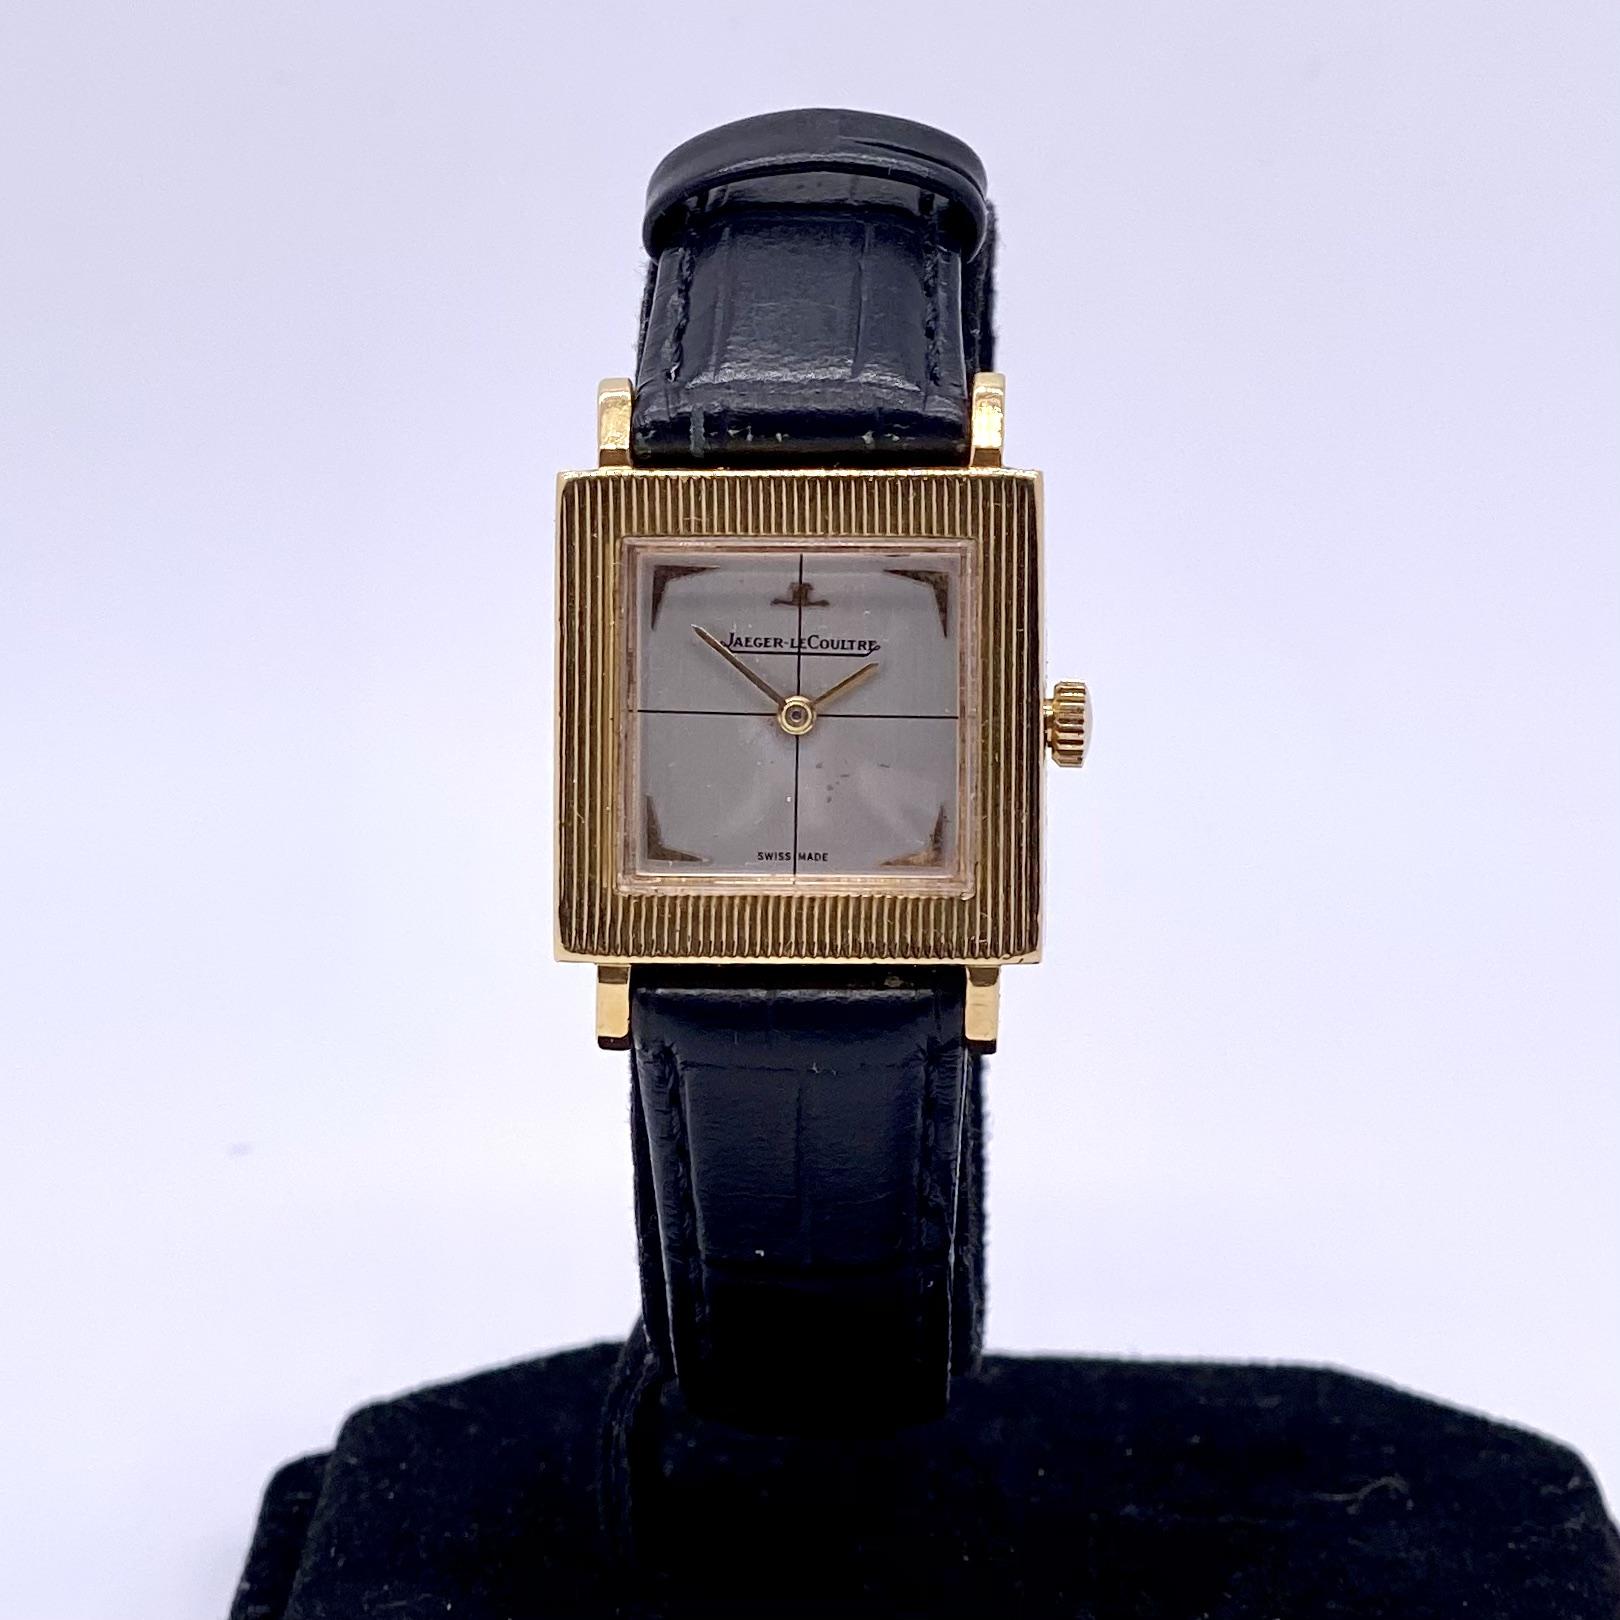 Jaeger le Coultre 18ct Watch